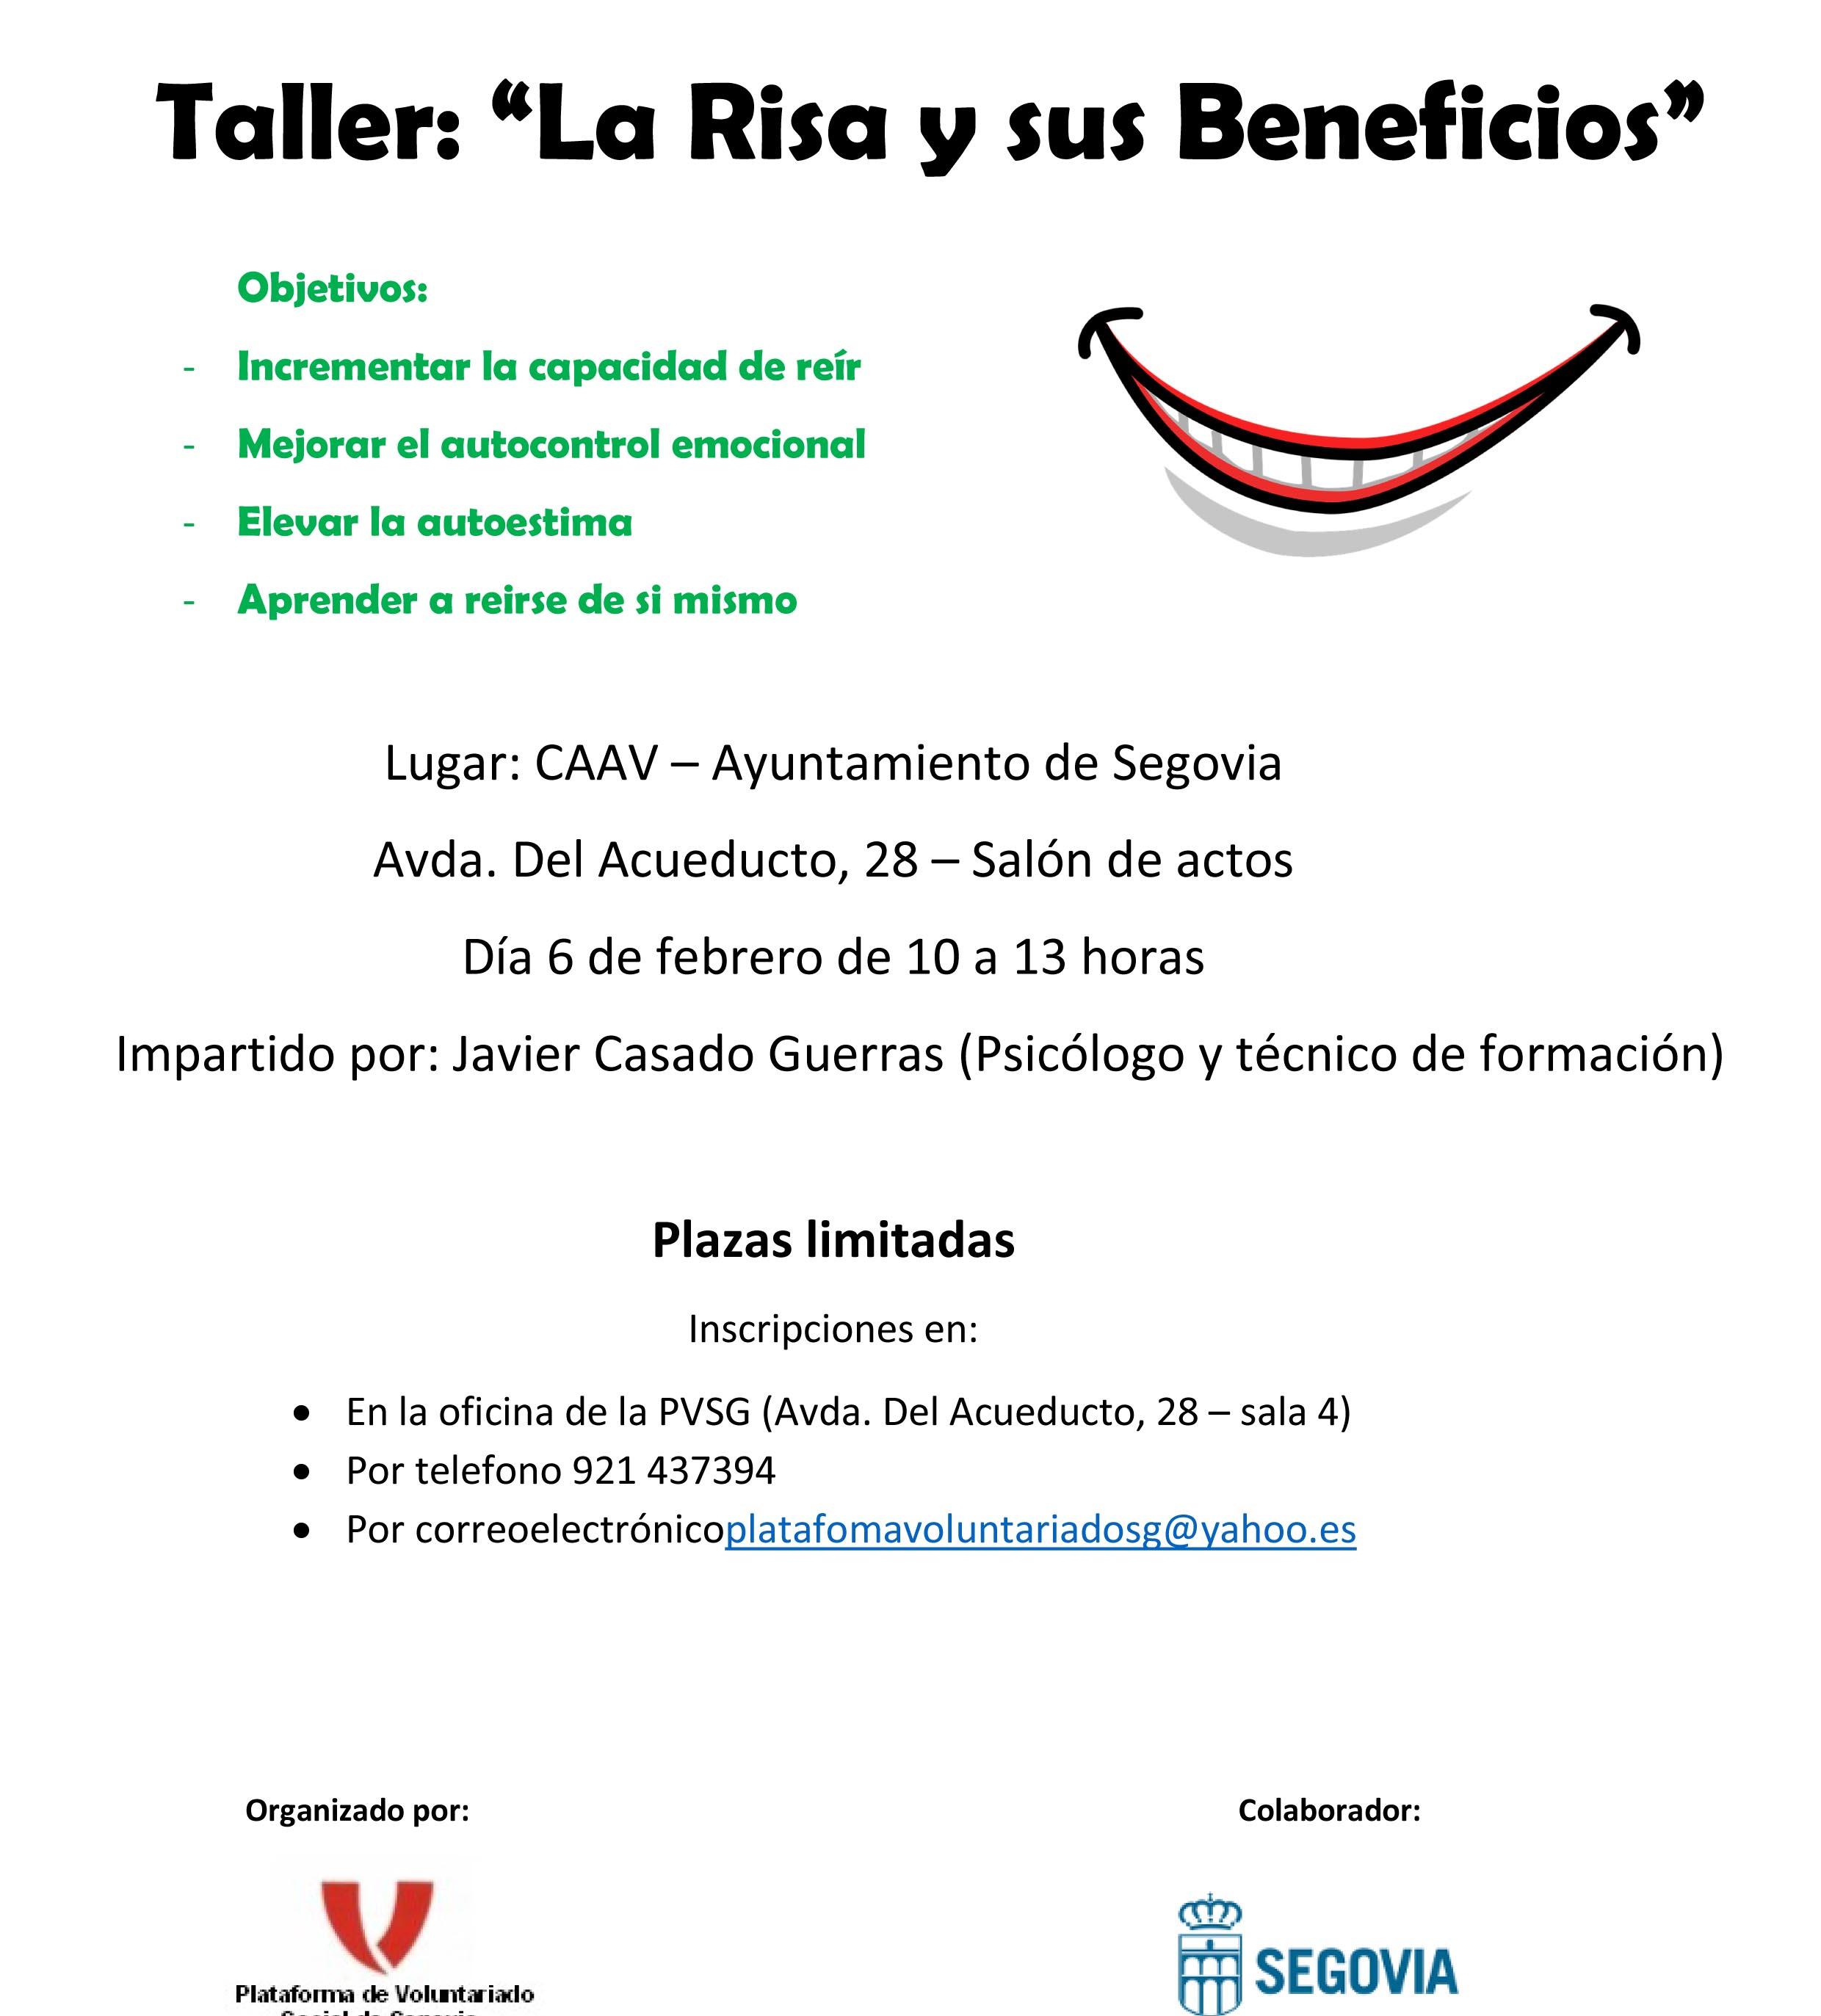 Taller de risoterapia-Cartel